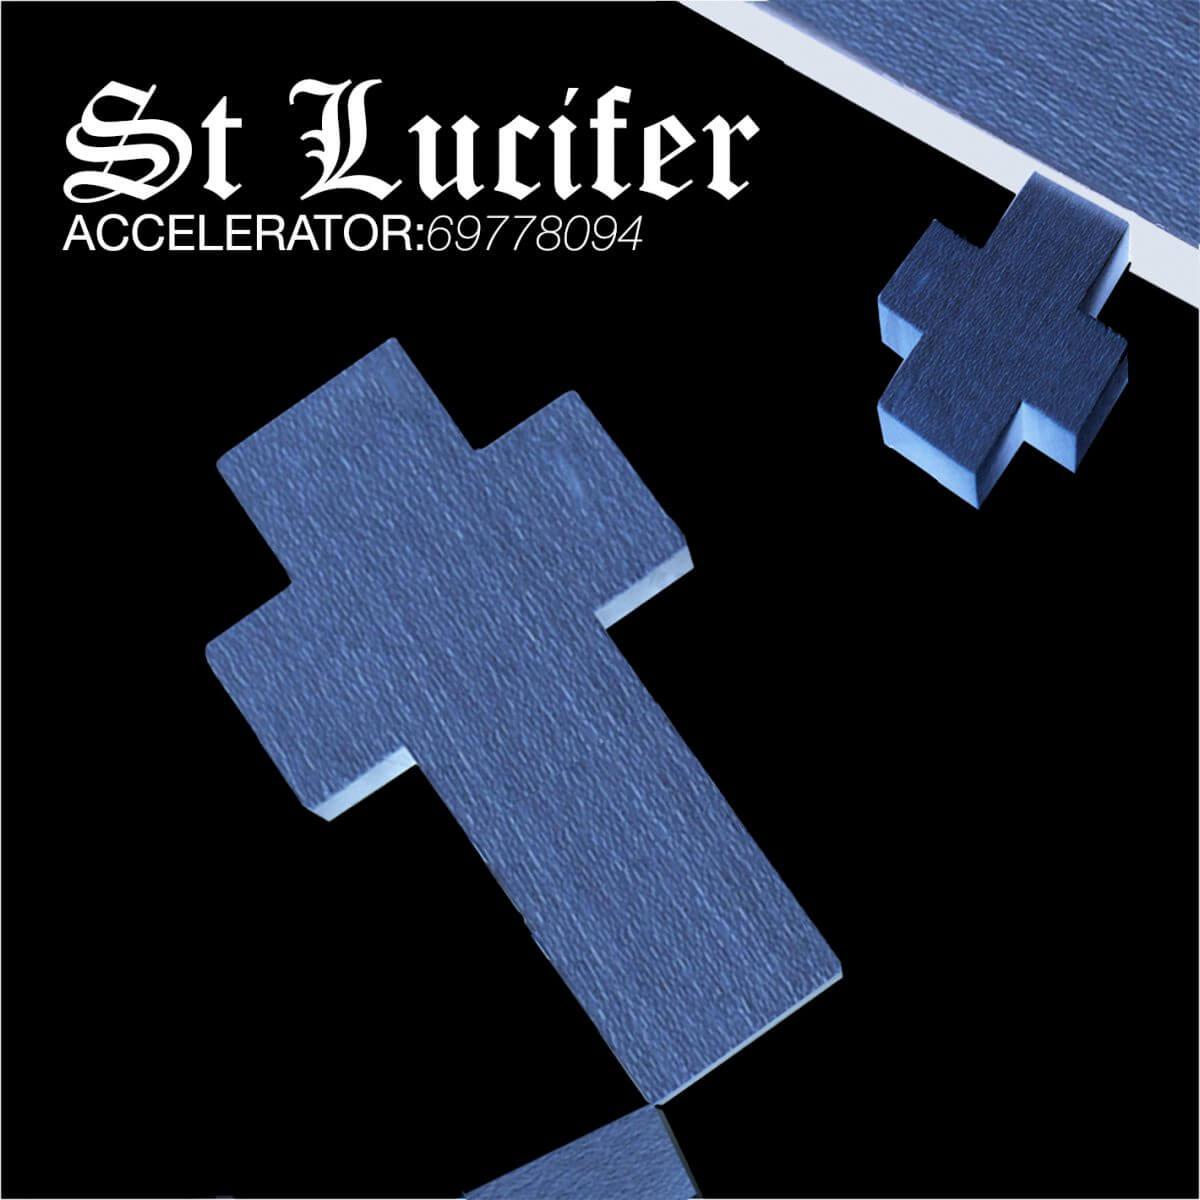 St Lucifer – Accelerator:69778094